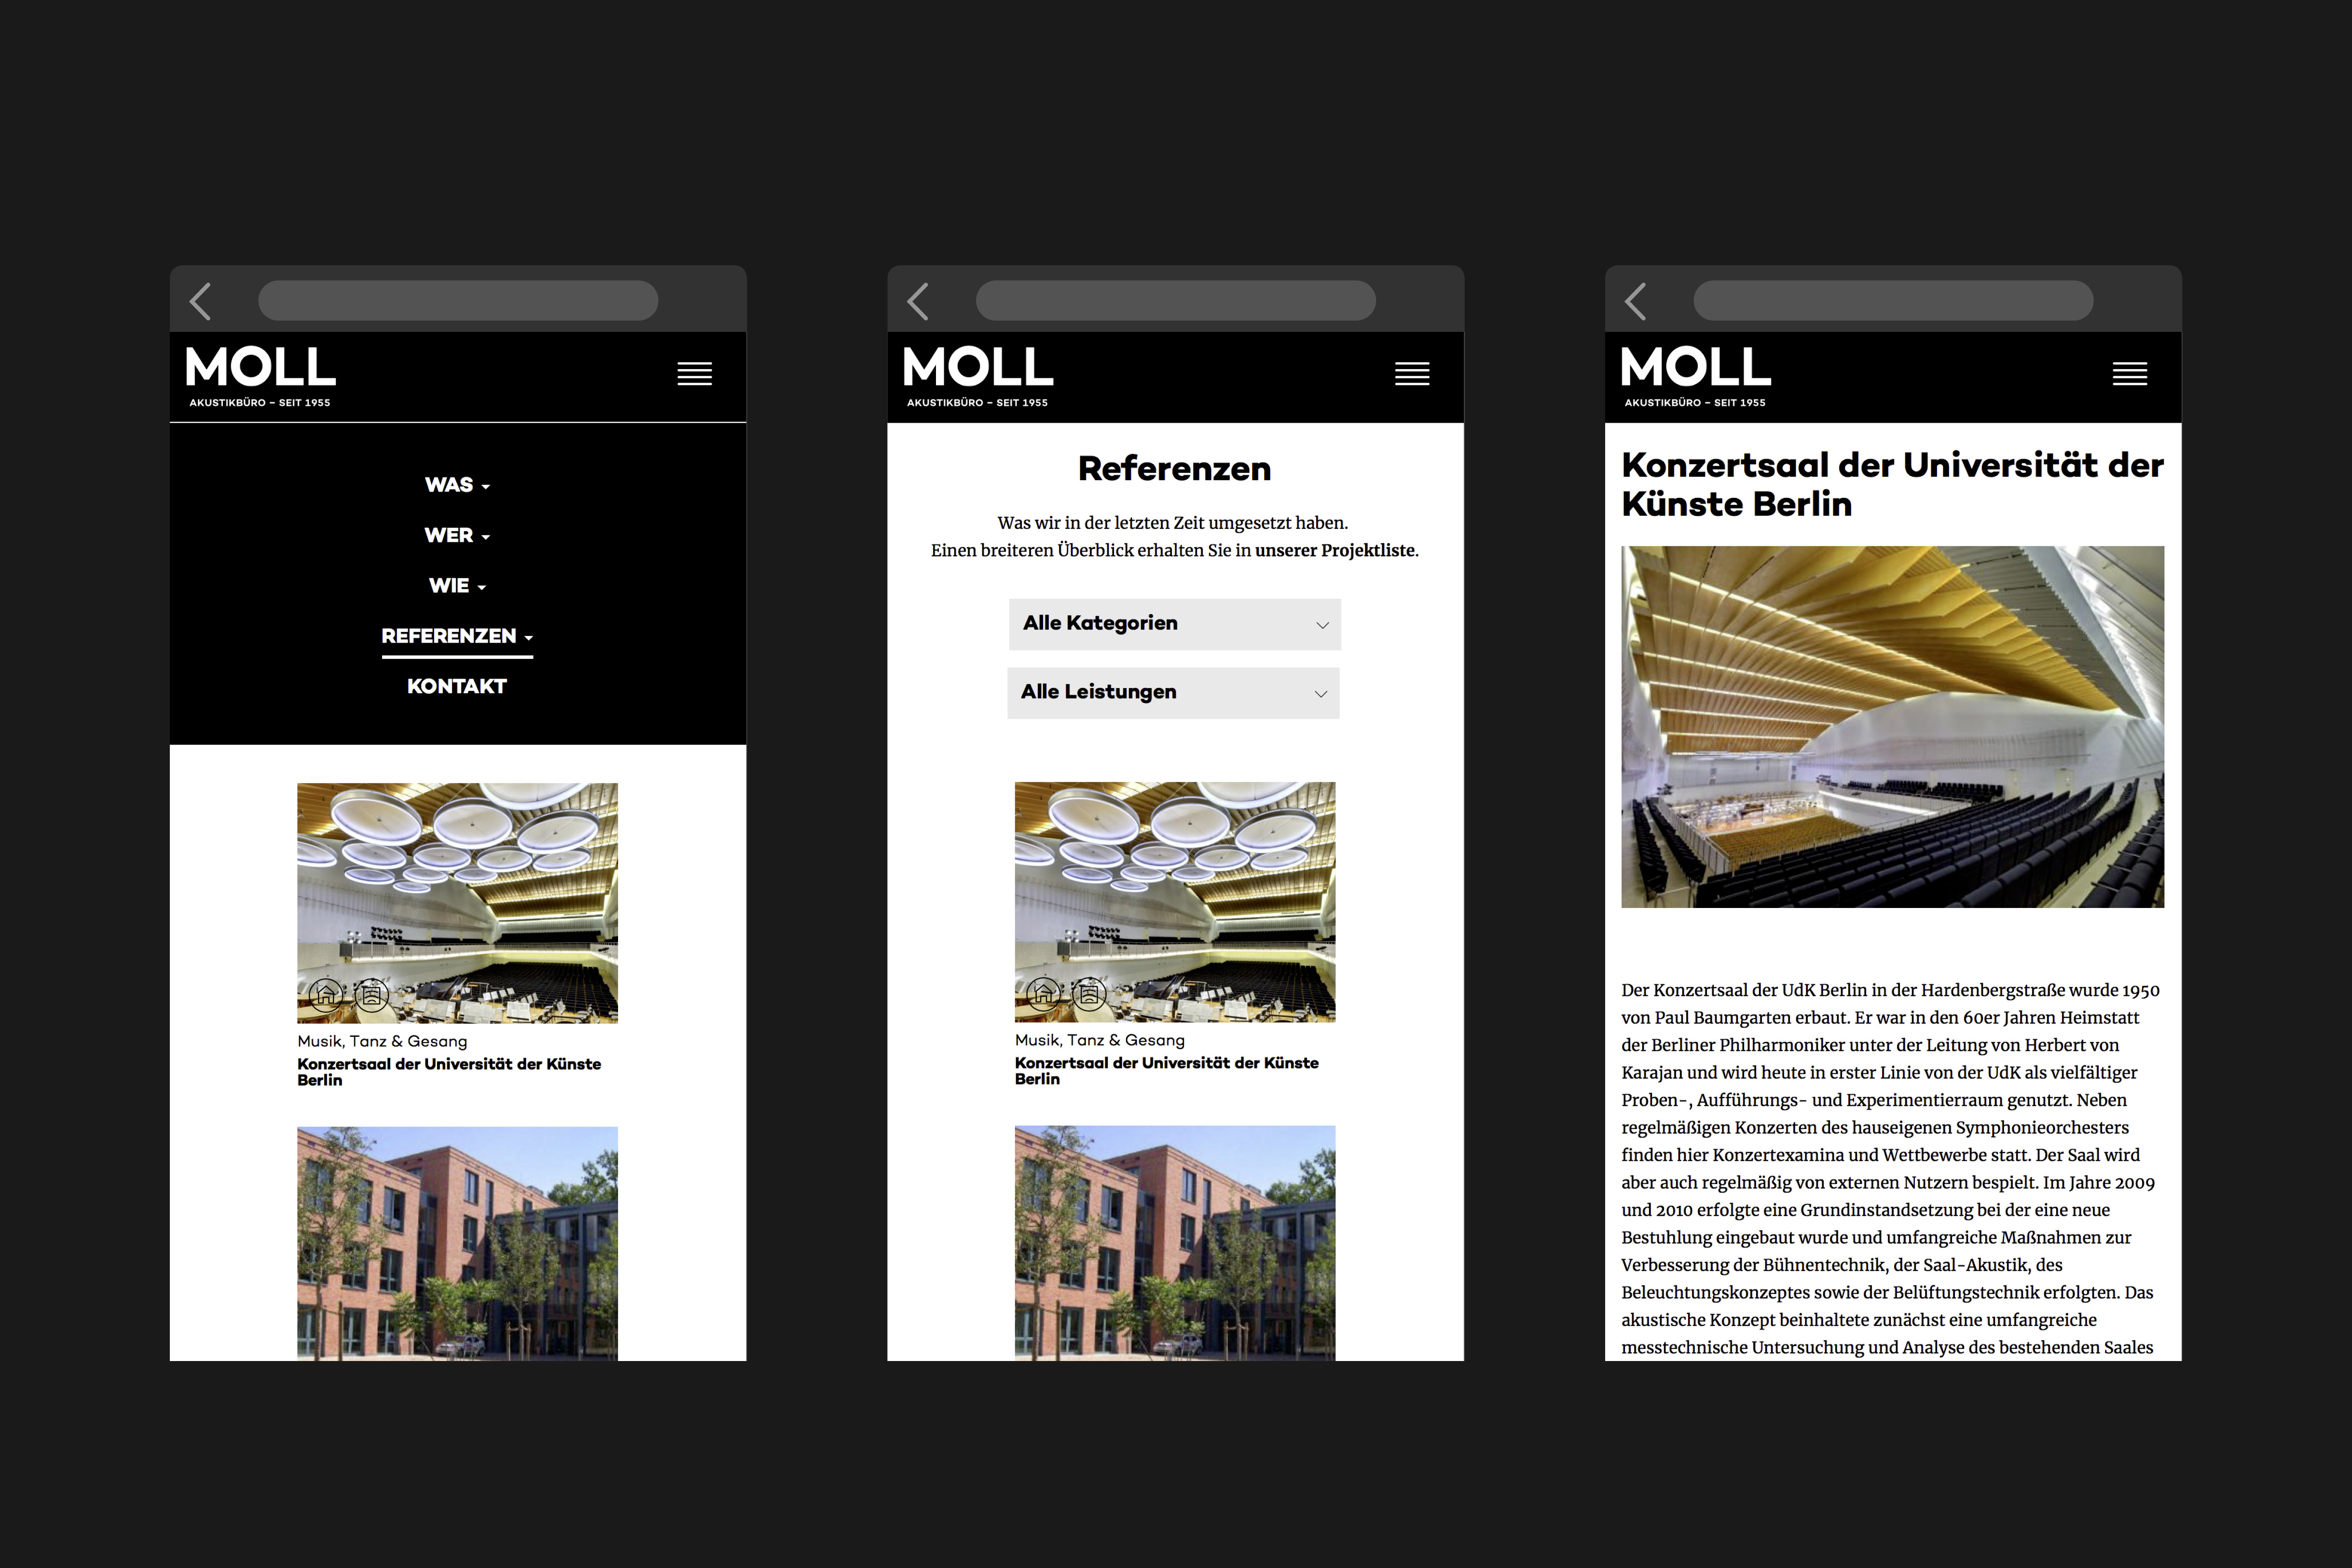 mab_Website_Mobile_Doku_fd-Webseite_Screens_schwarz_smartphone2